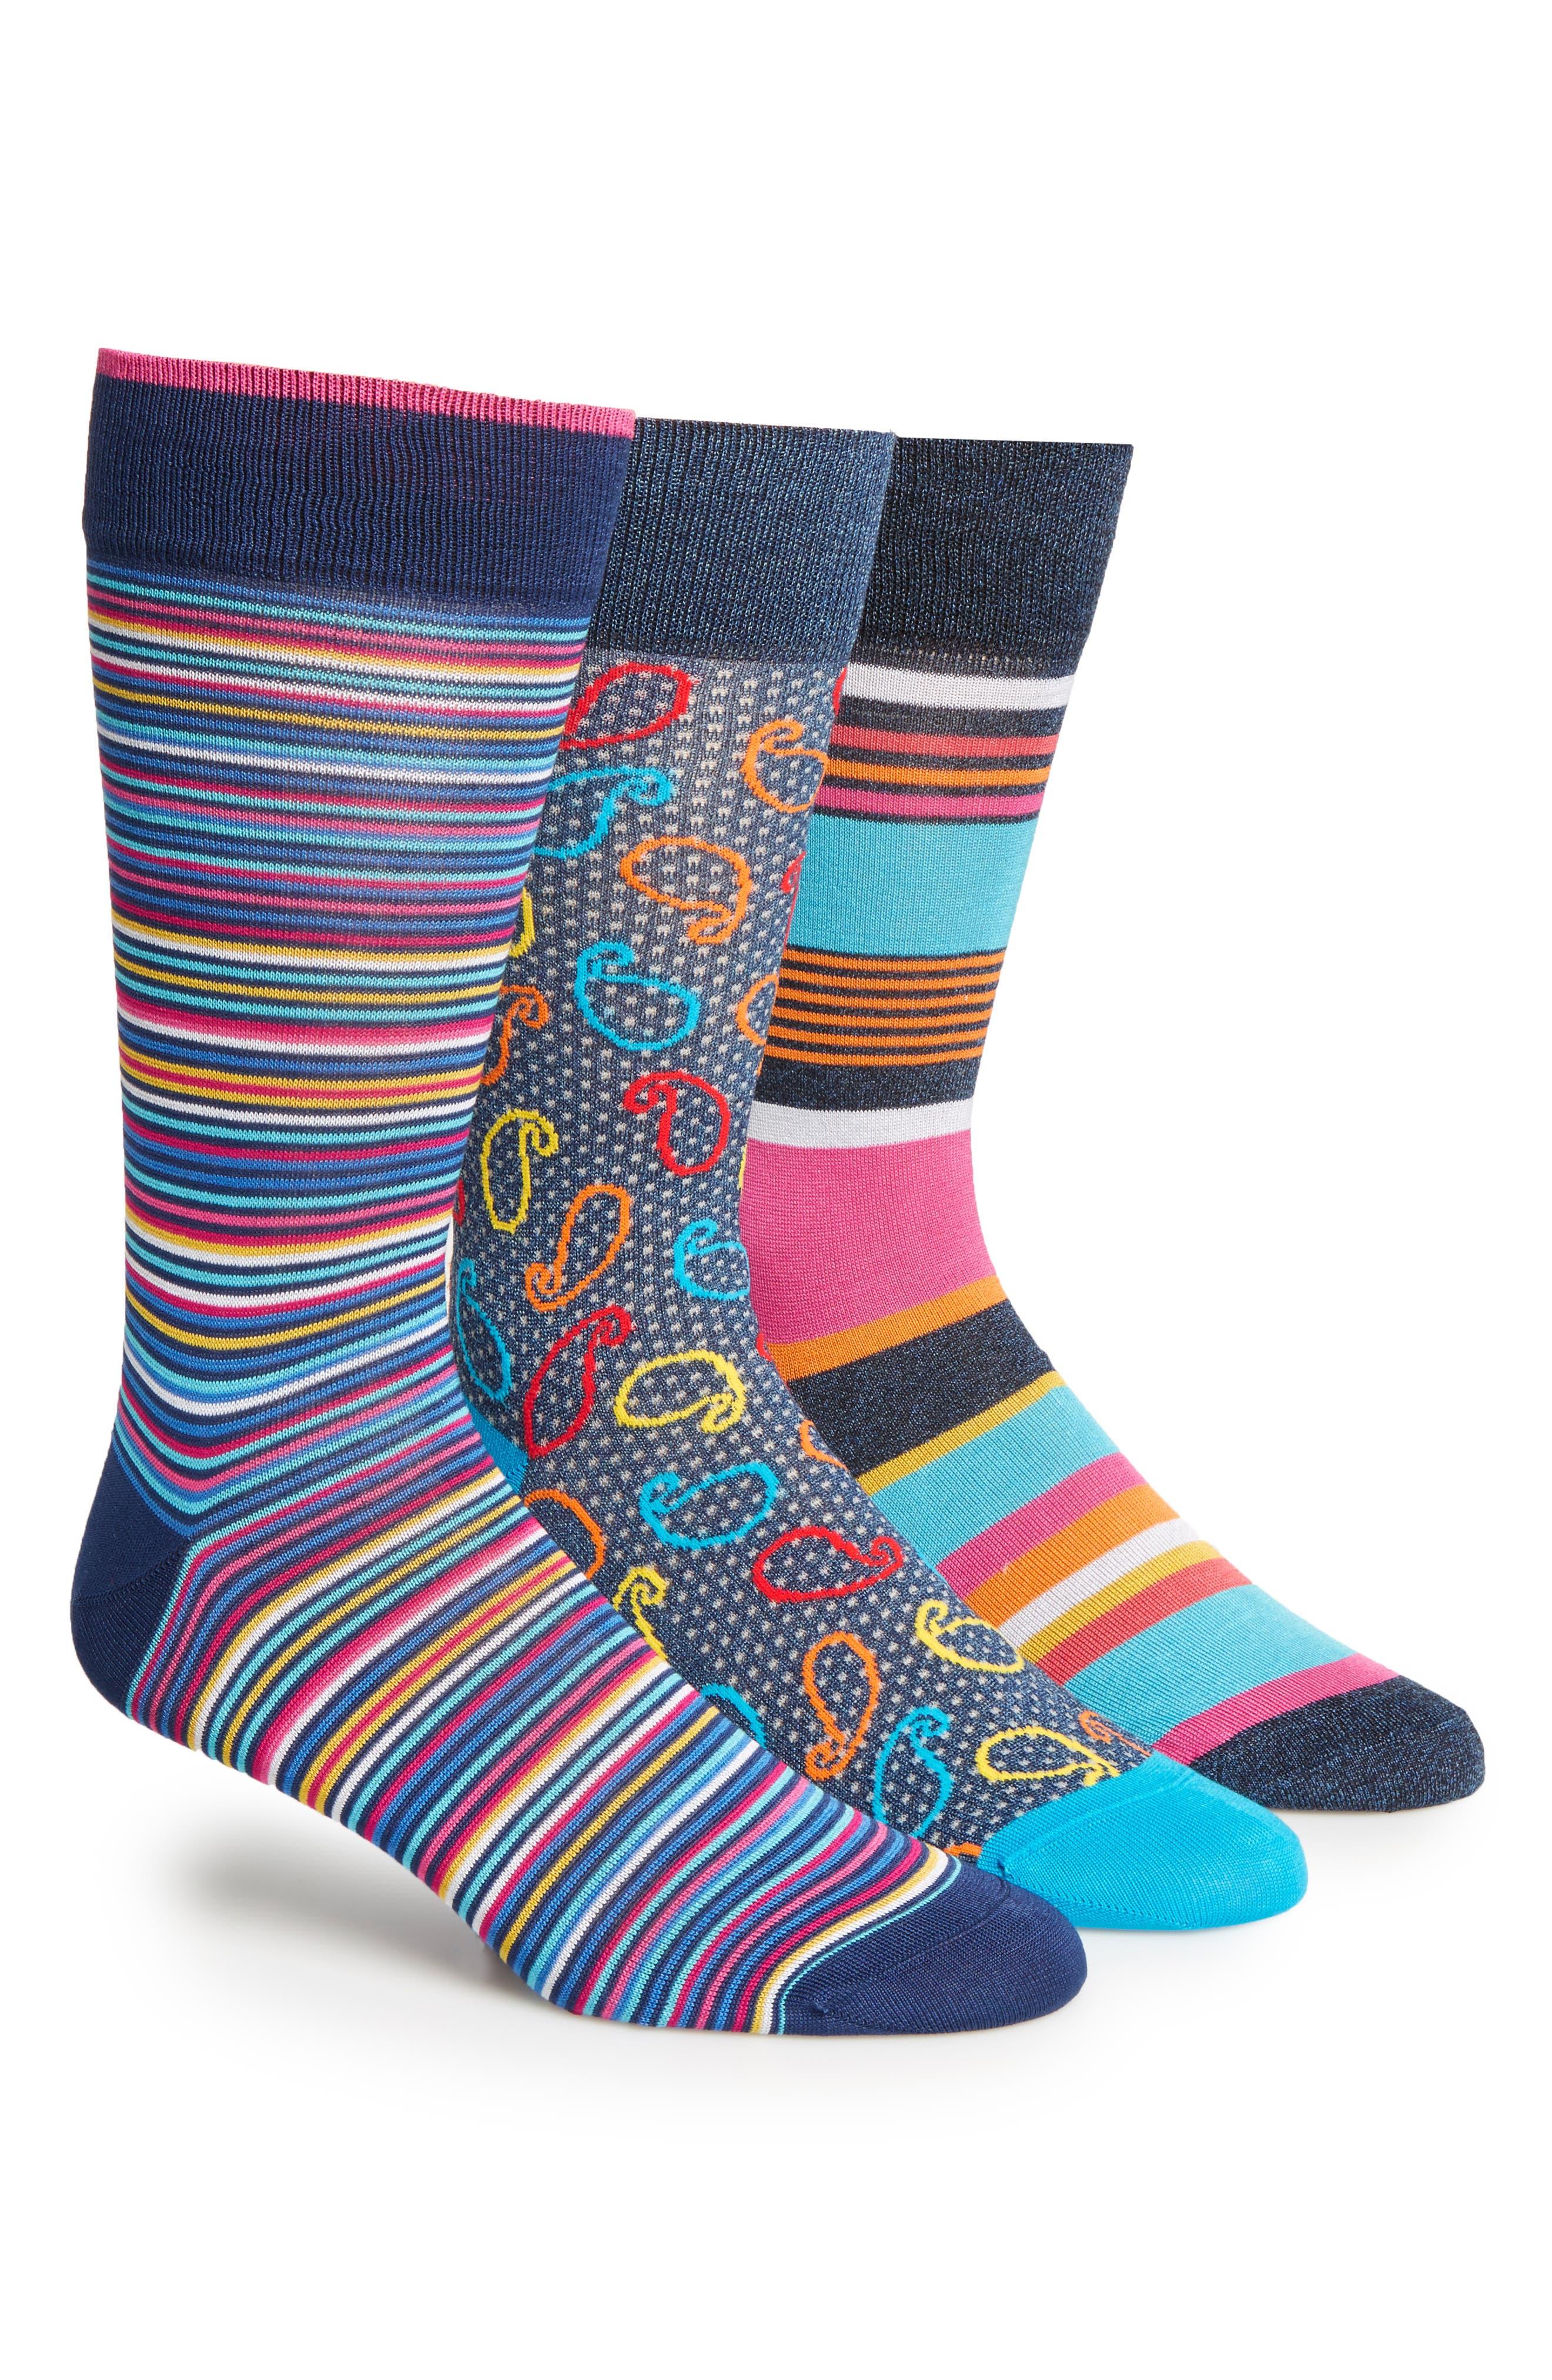 3-Pack Cotton Blend Socks,                         Main,                         color, 410